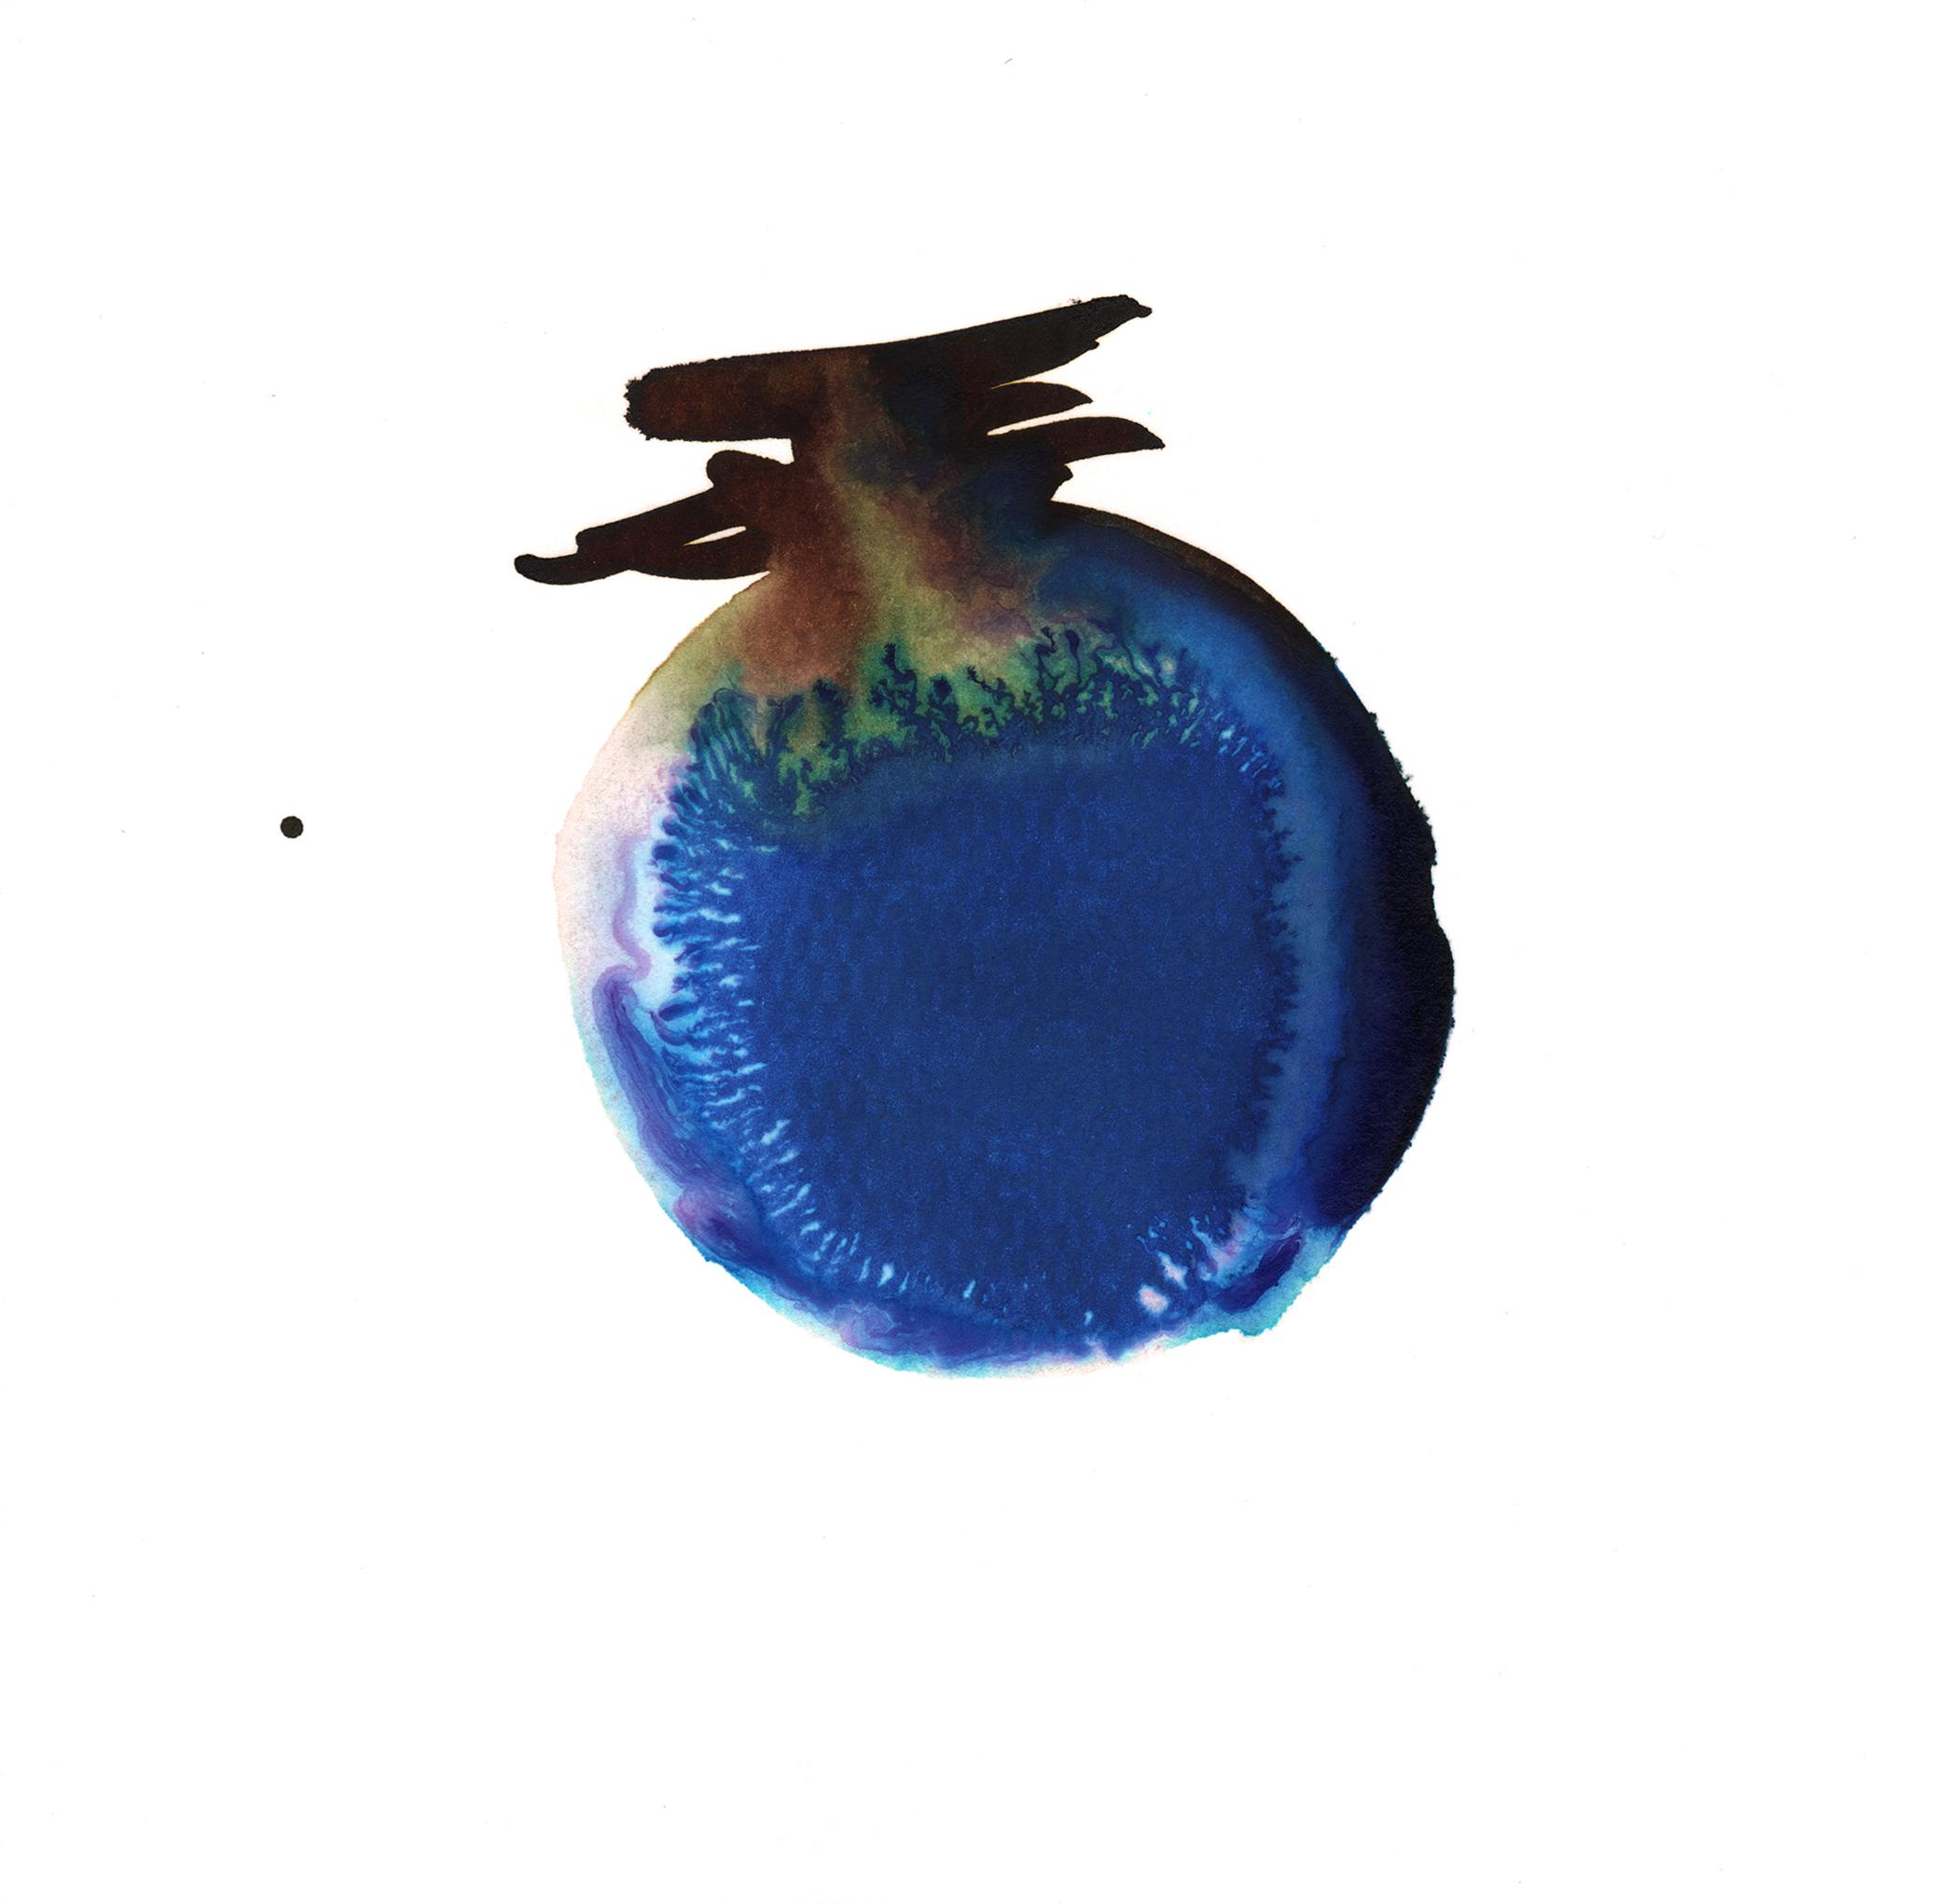 316.Blueberry.12.21.14.jpg